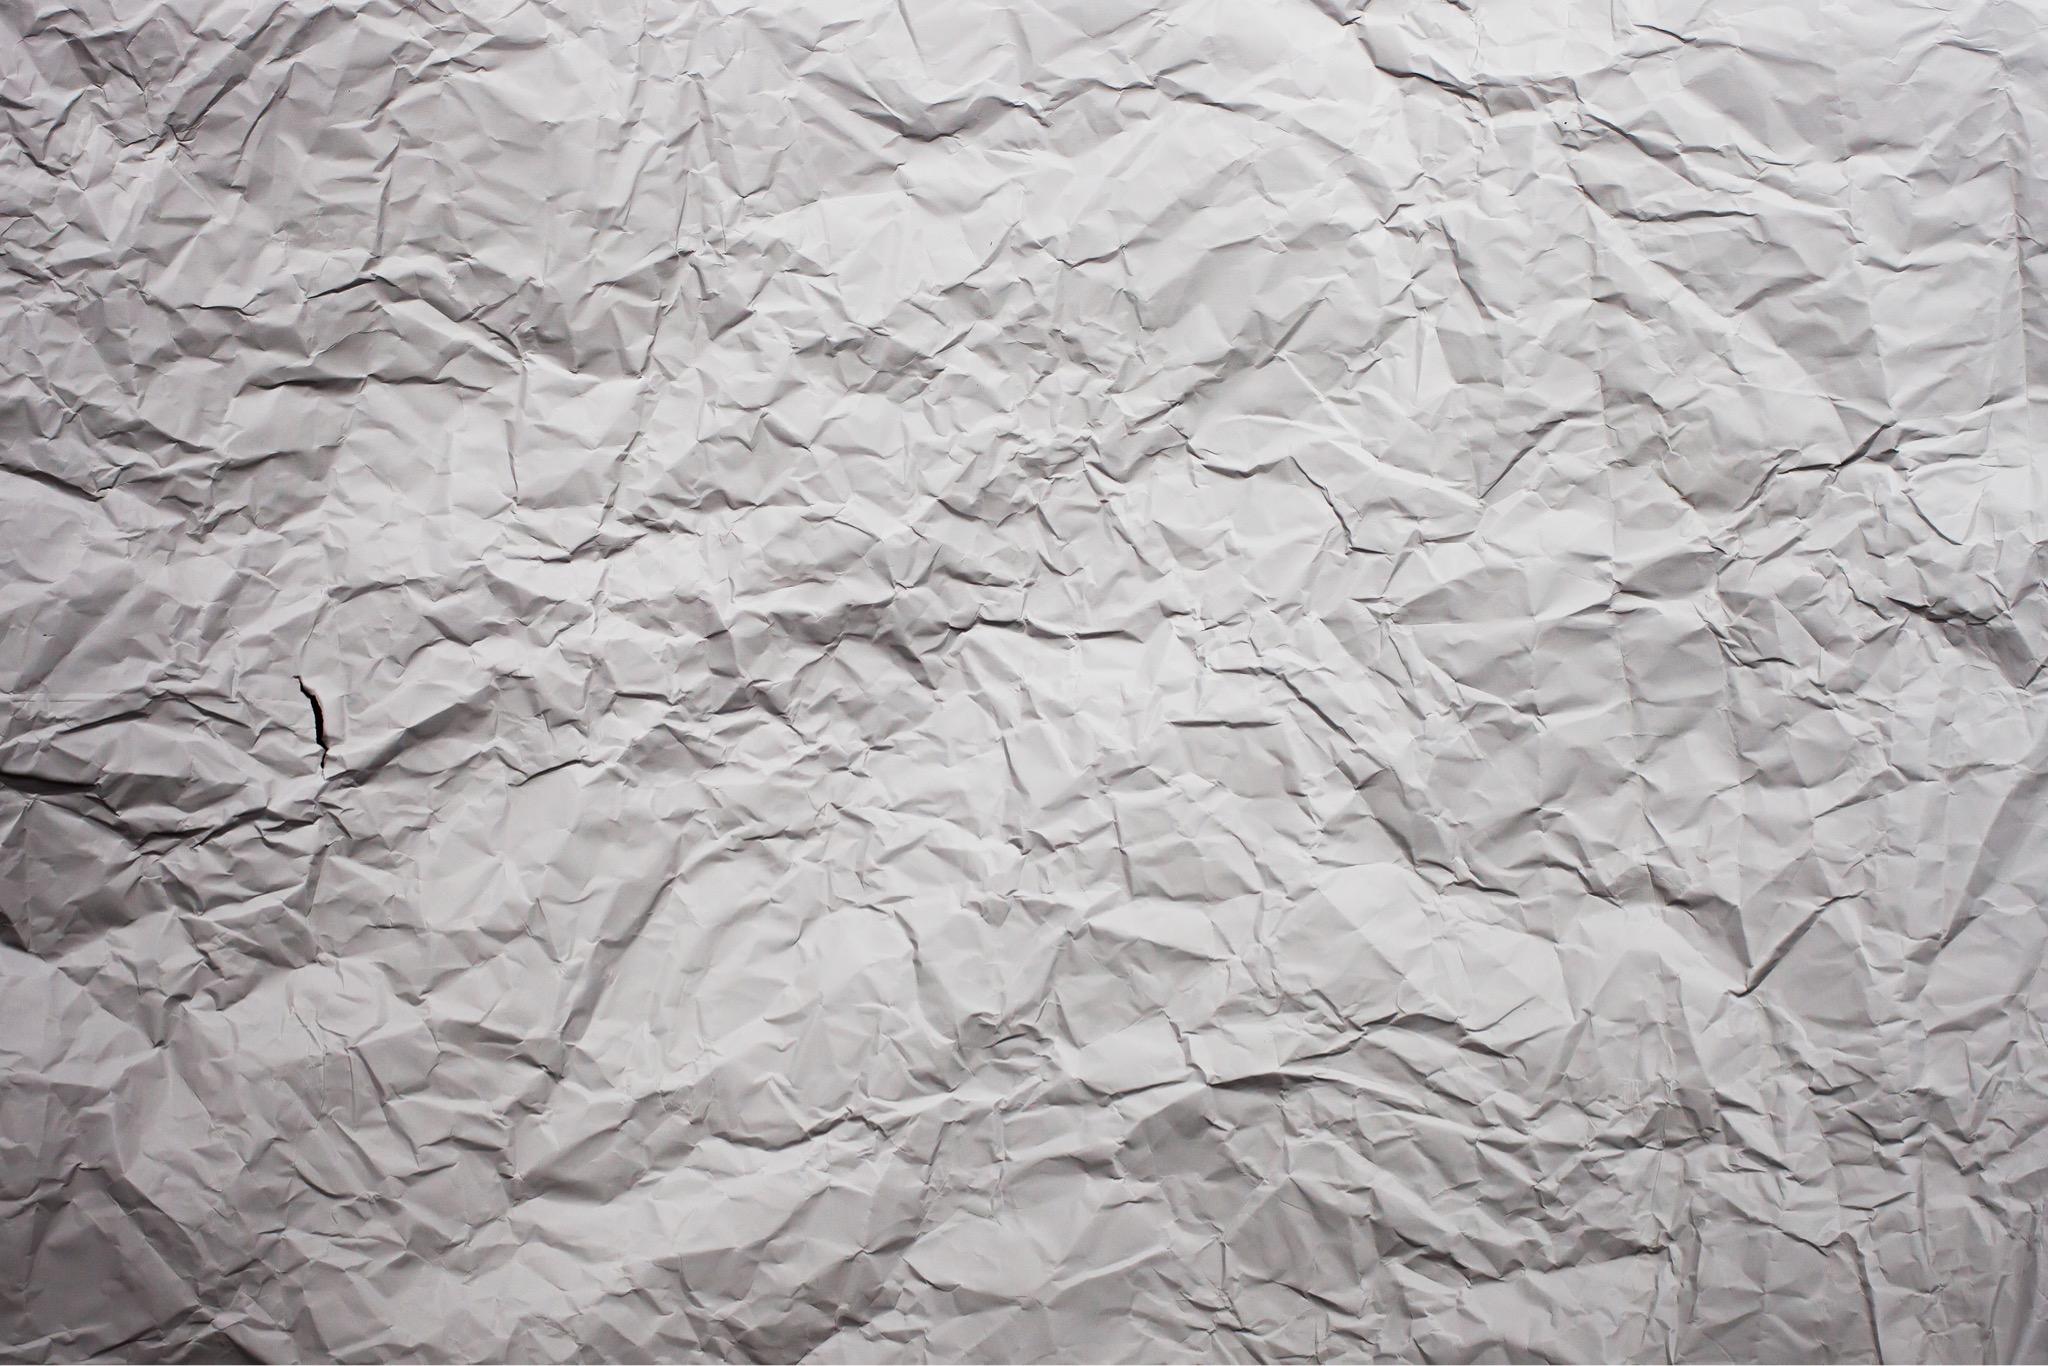 creased-white-paper